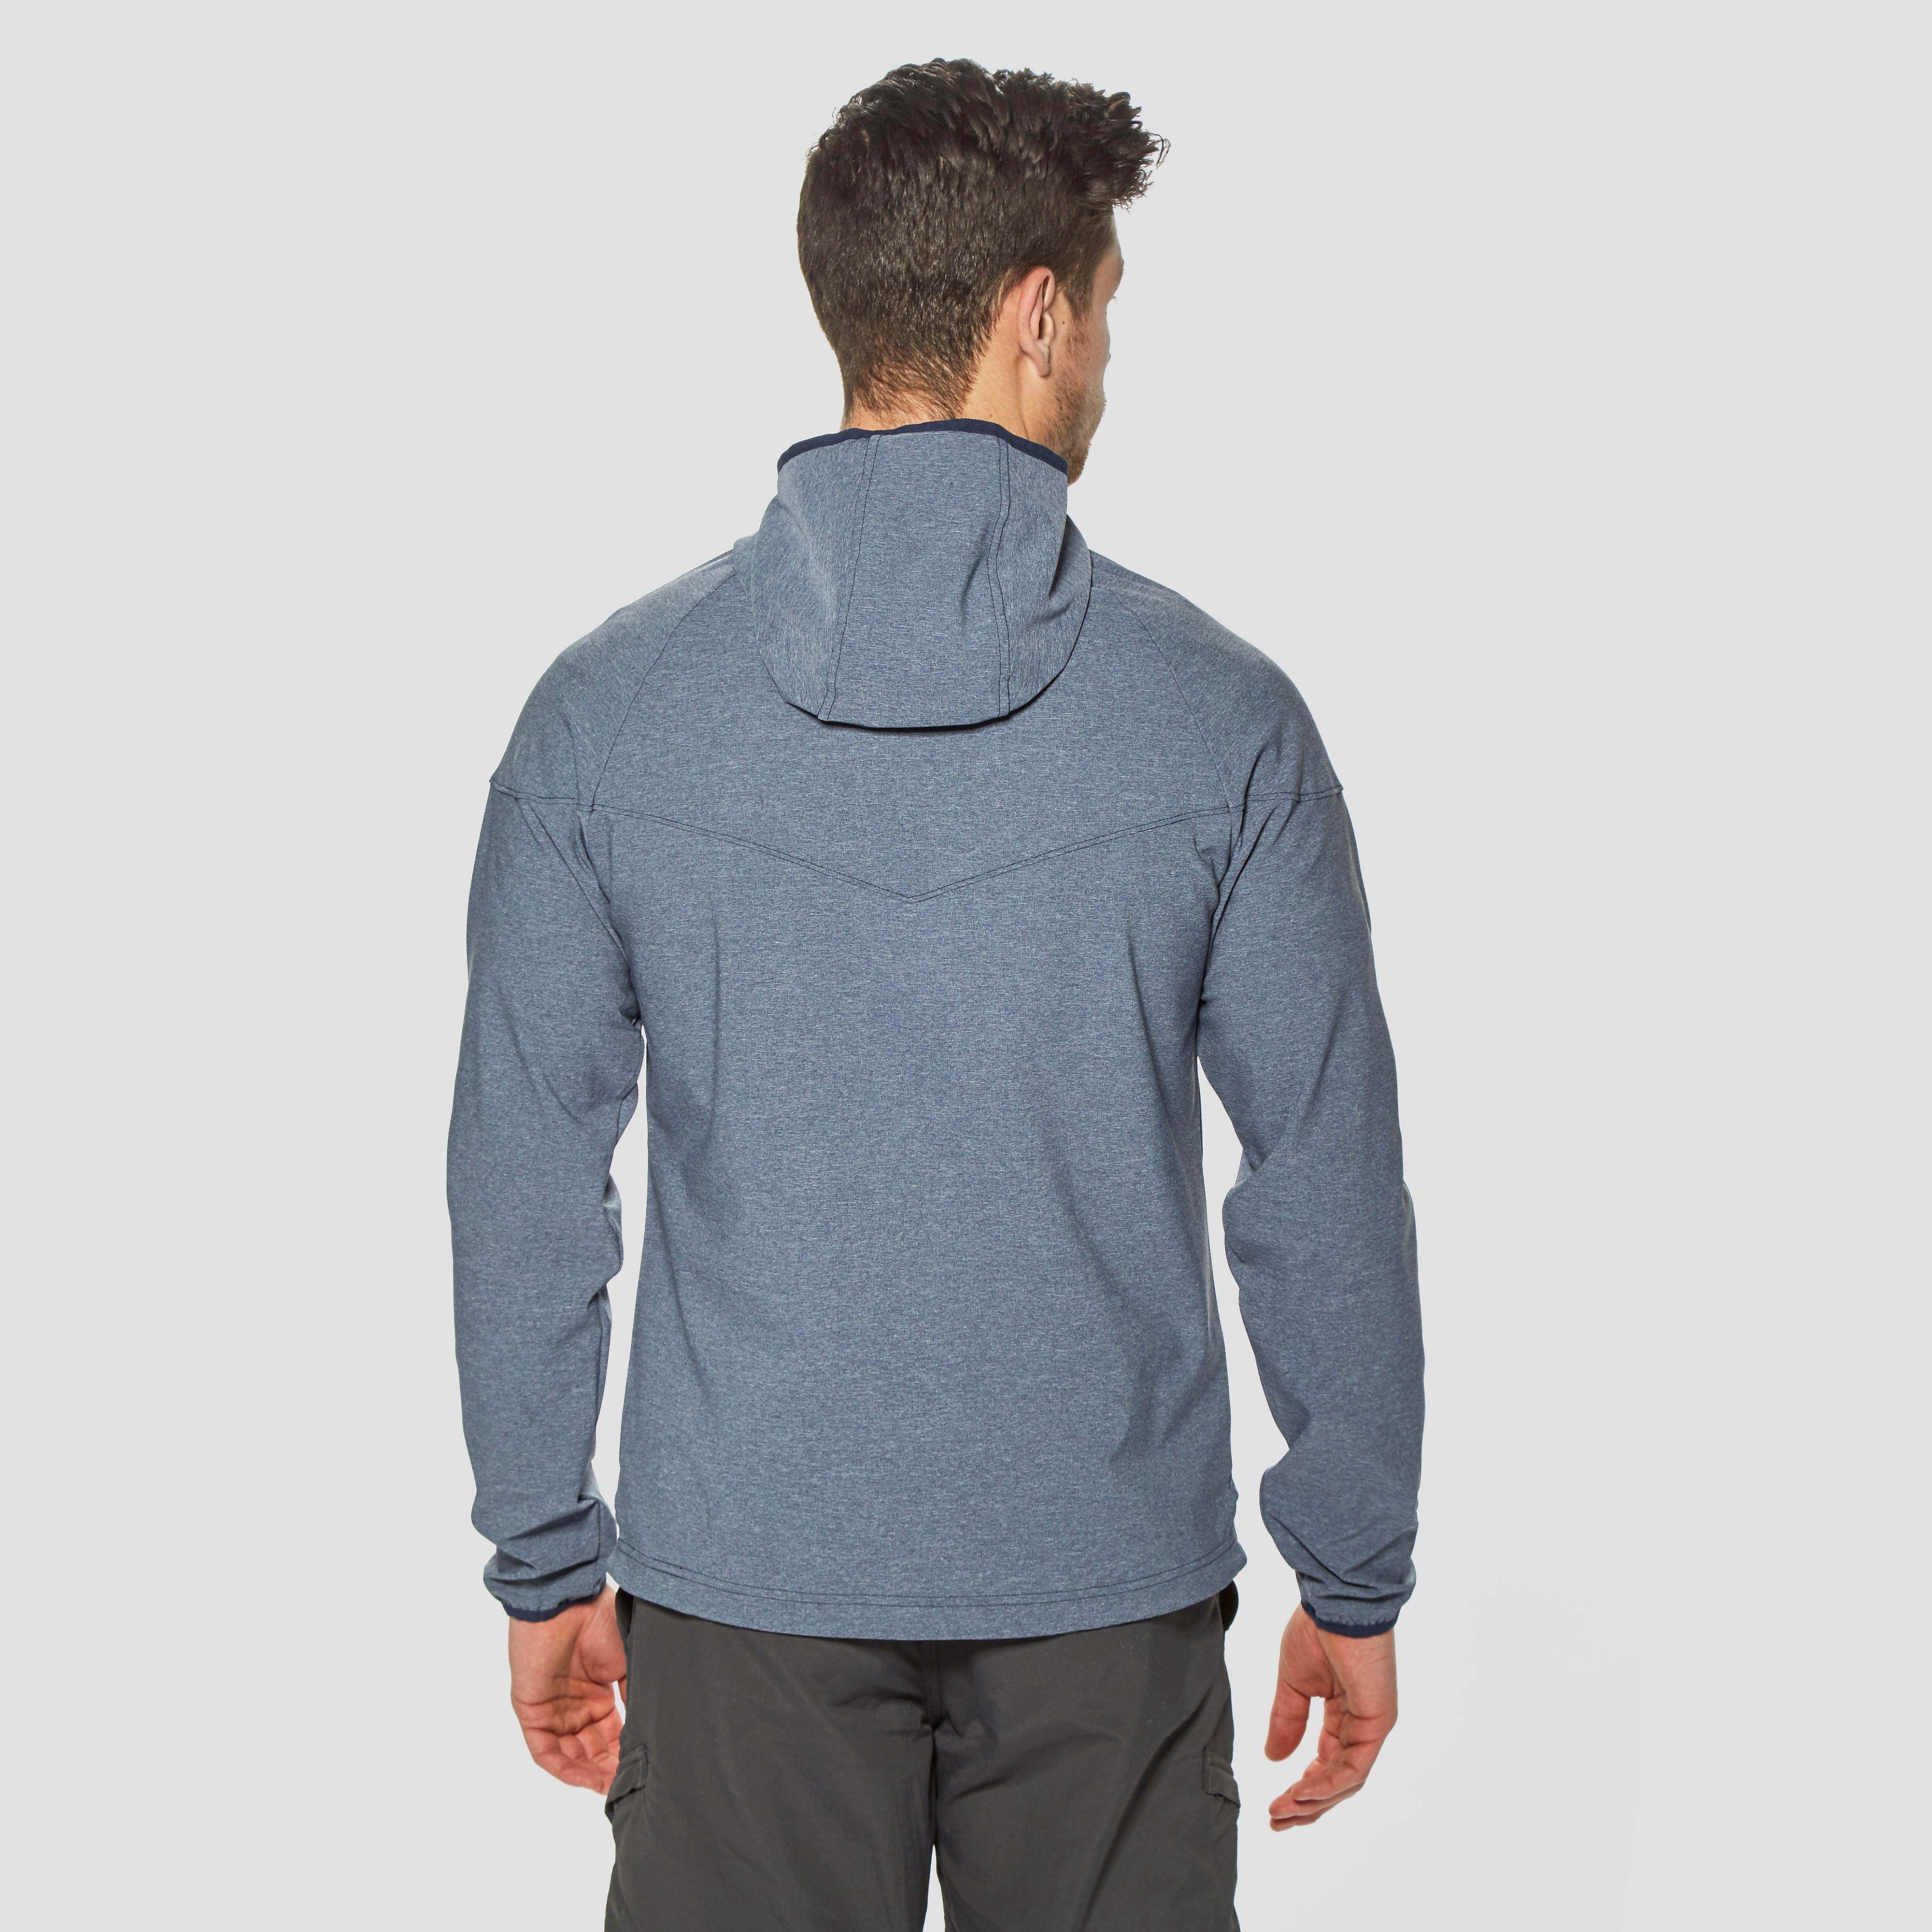 Columbia Heather Canyon Men's Jacket